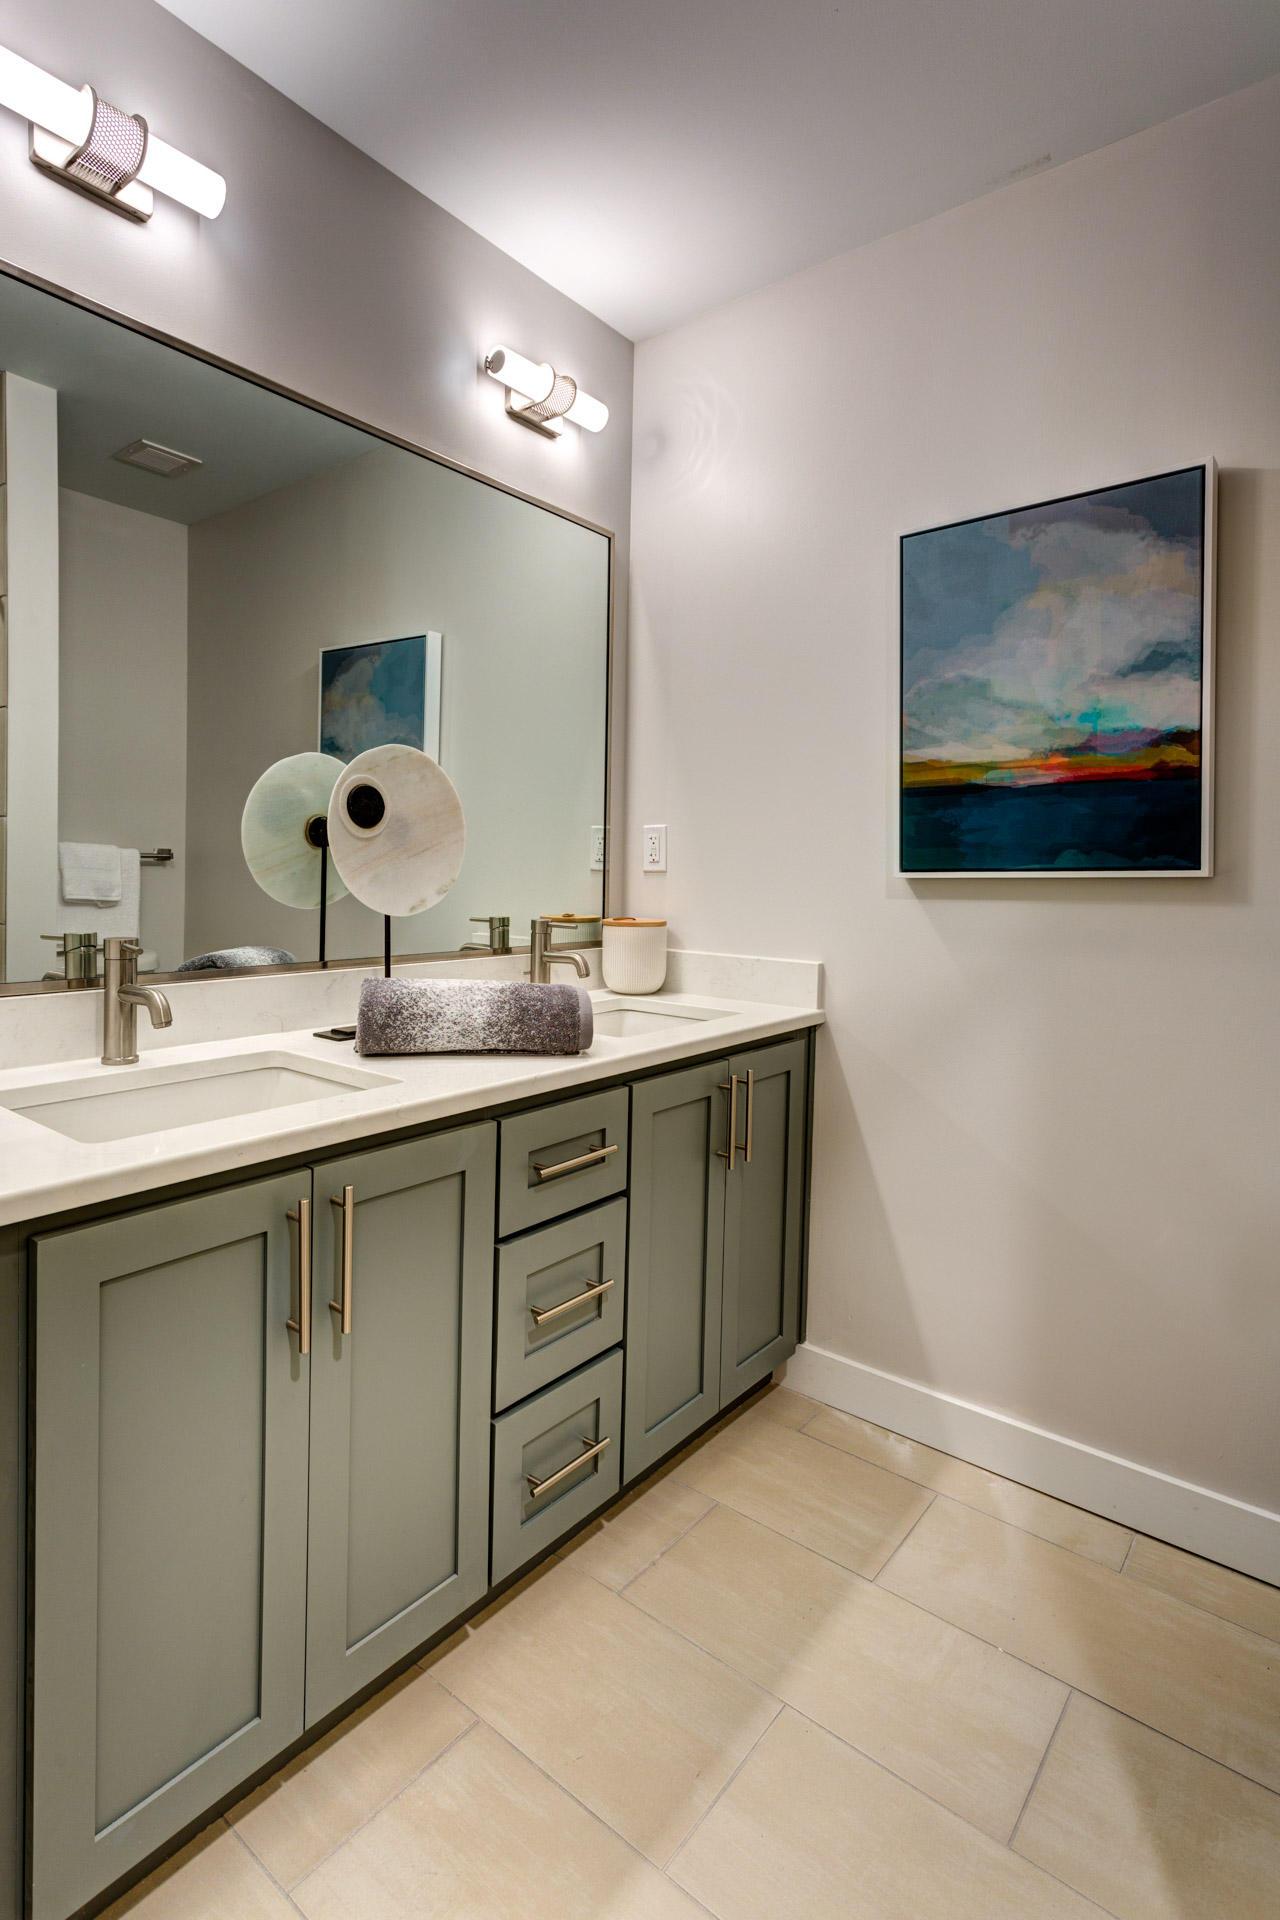 Icon Norfolk Apartments image 2